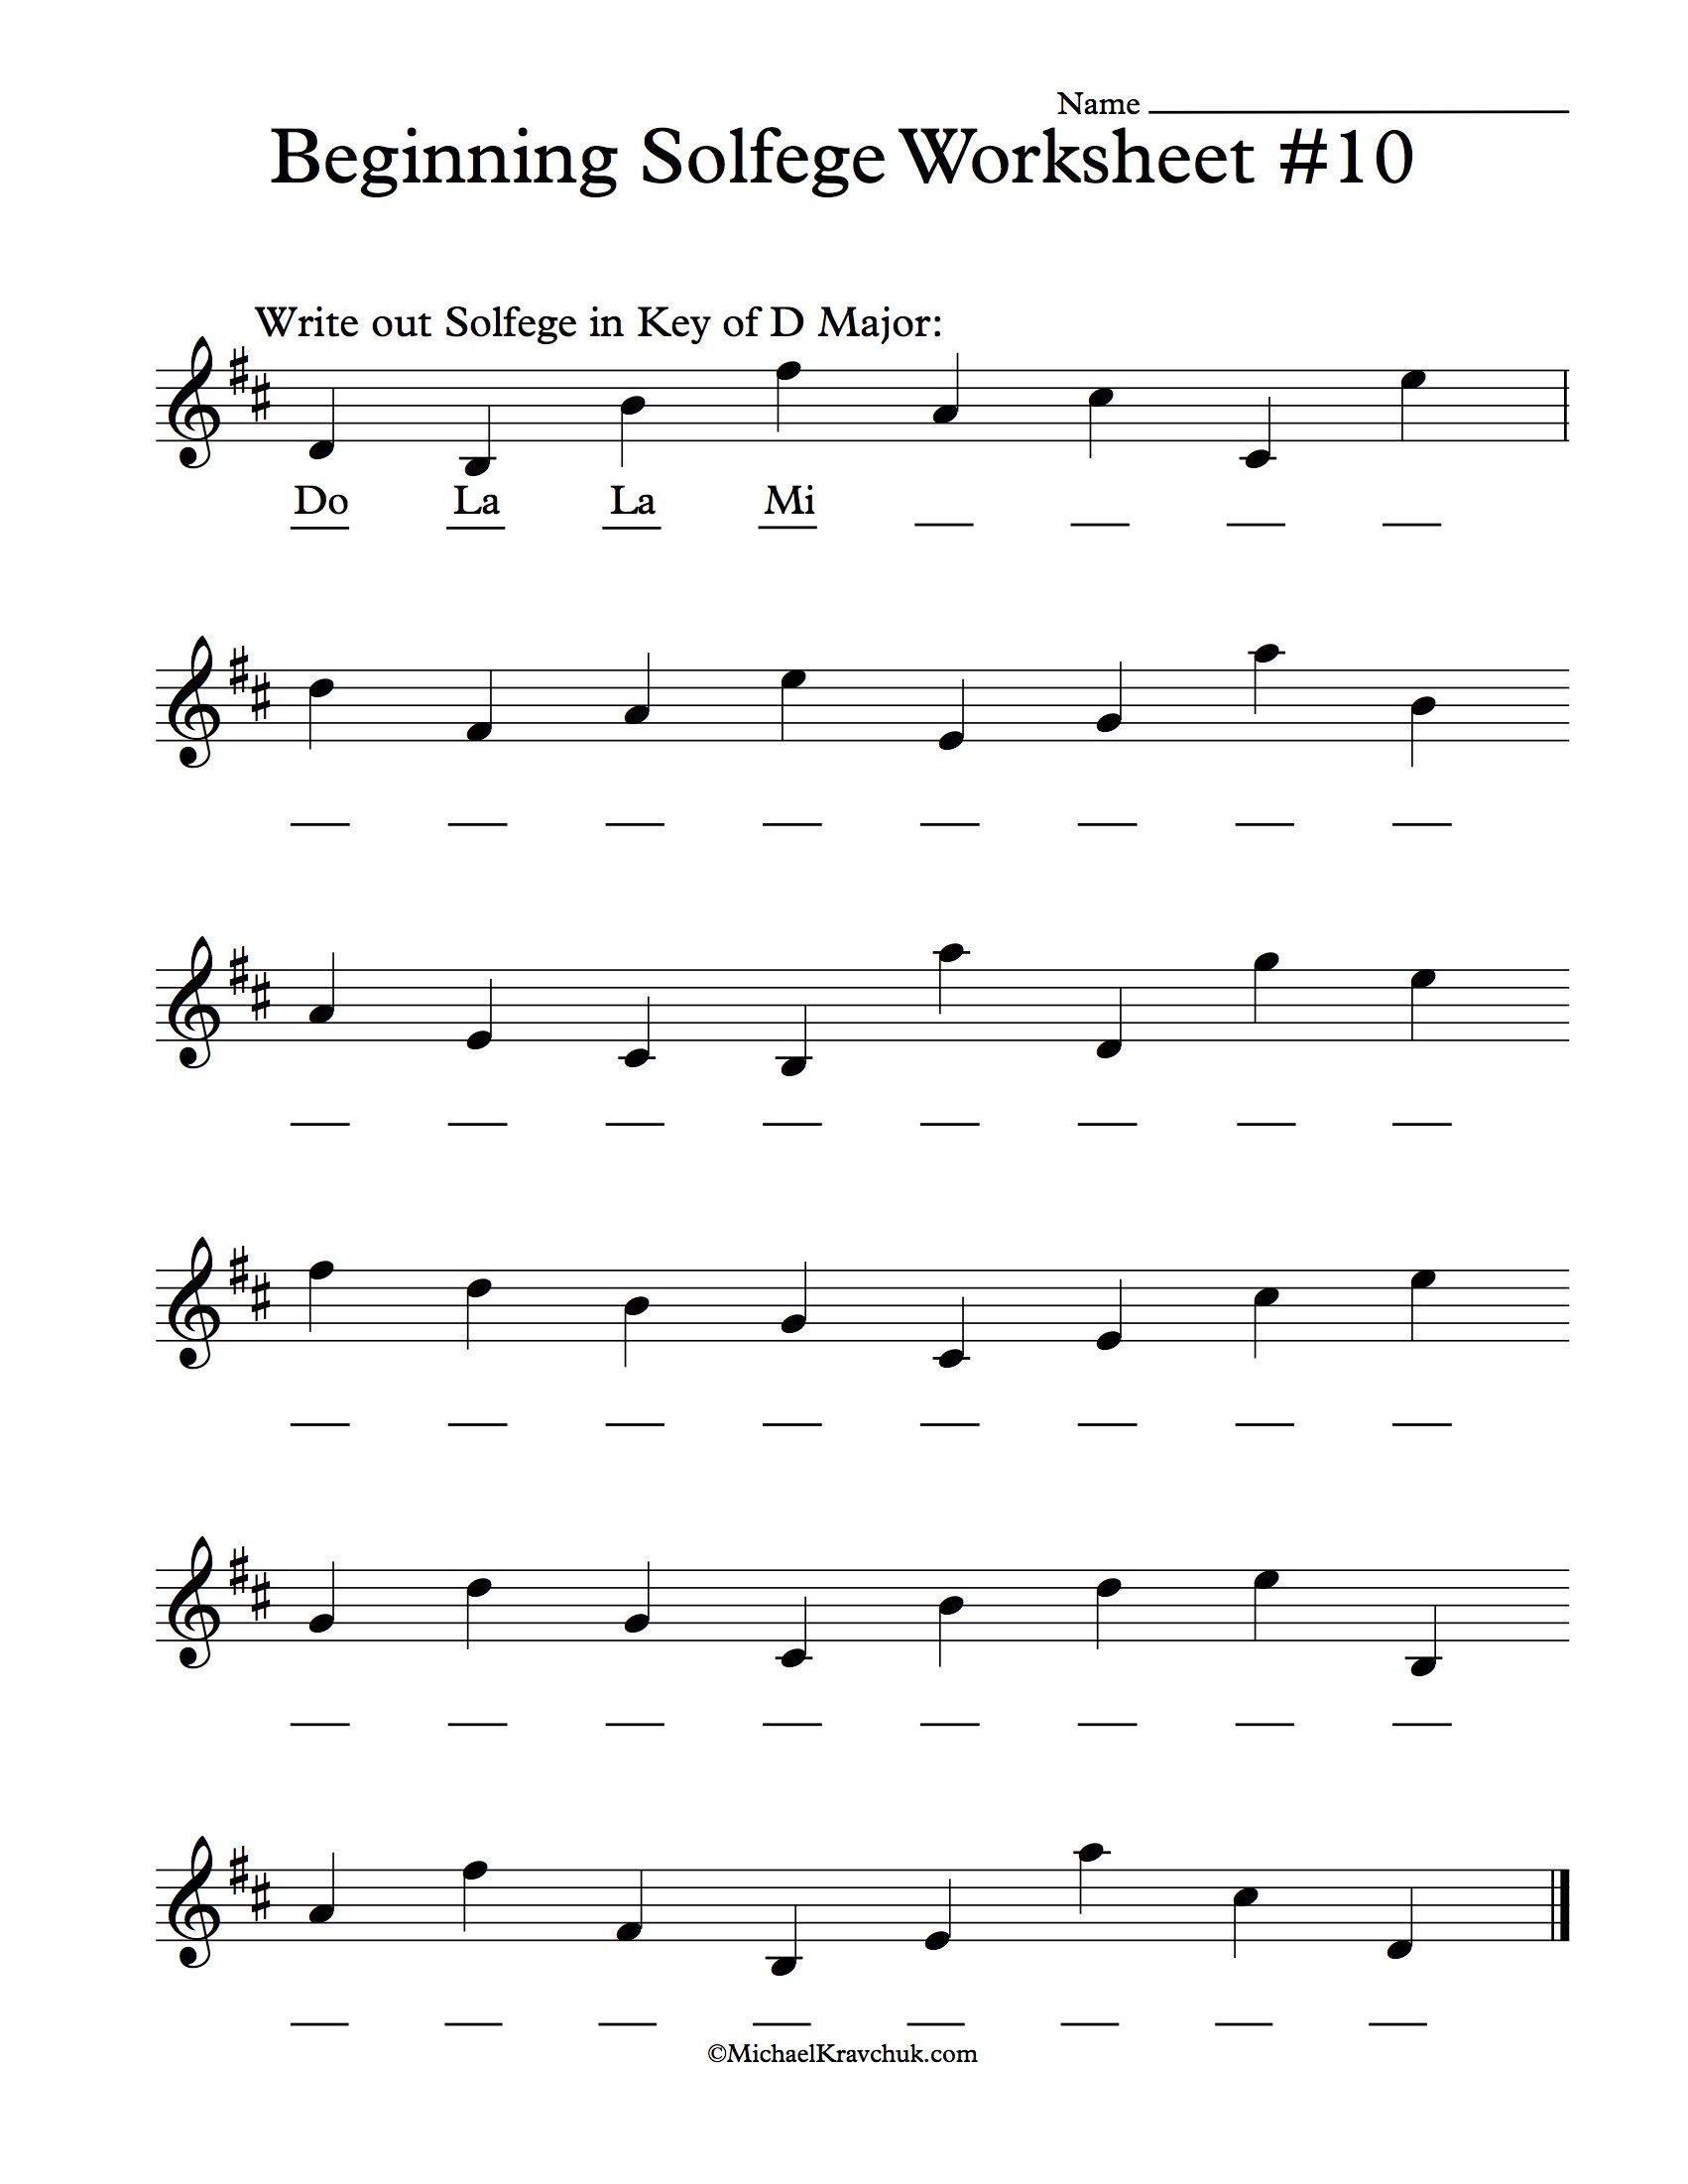 Beginning Solfege Worksheet 10 For Classroom Instructions